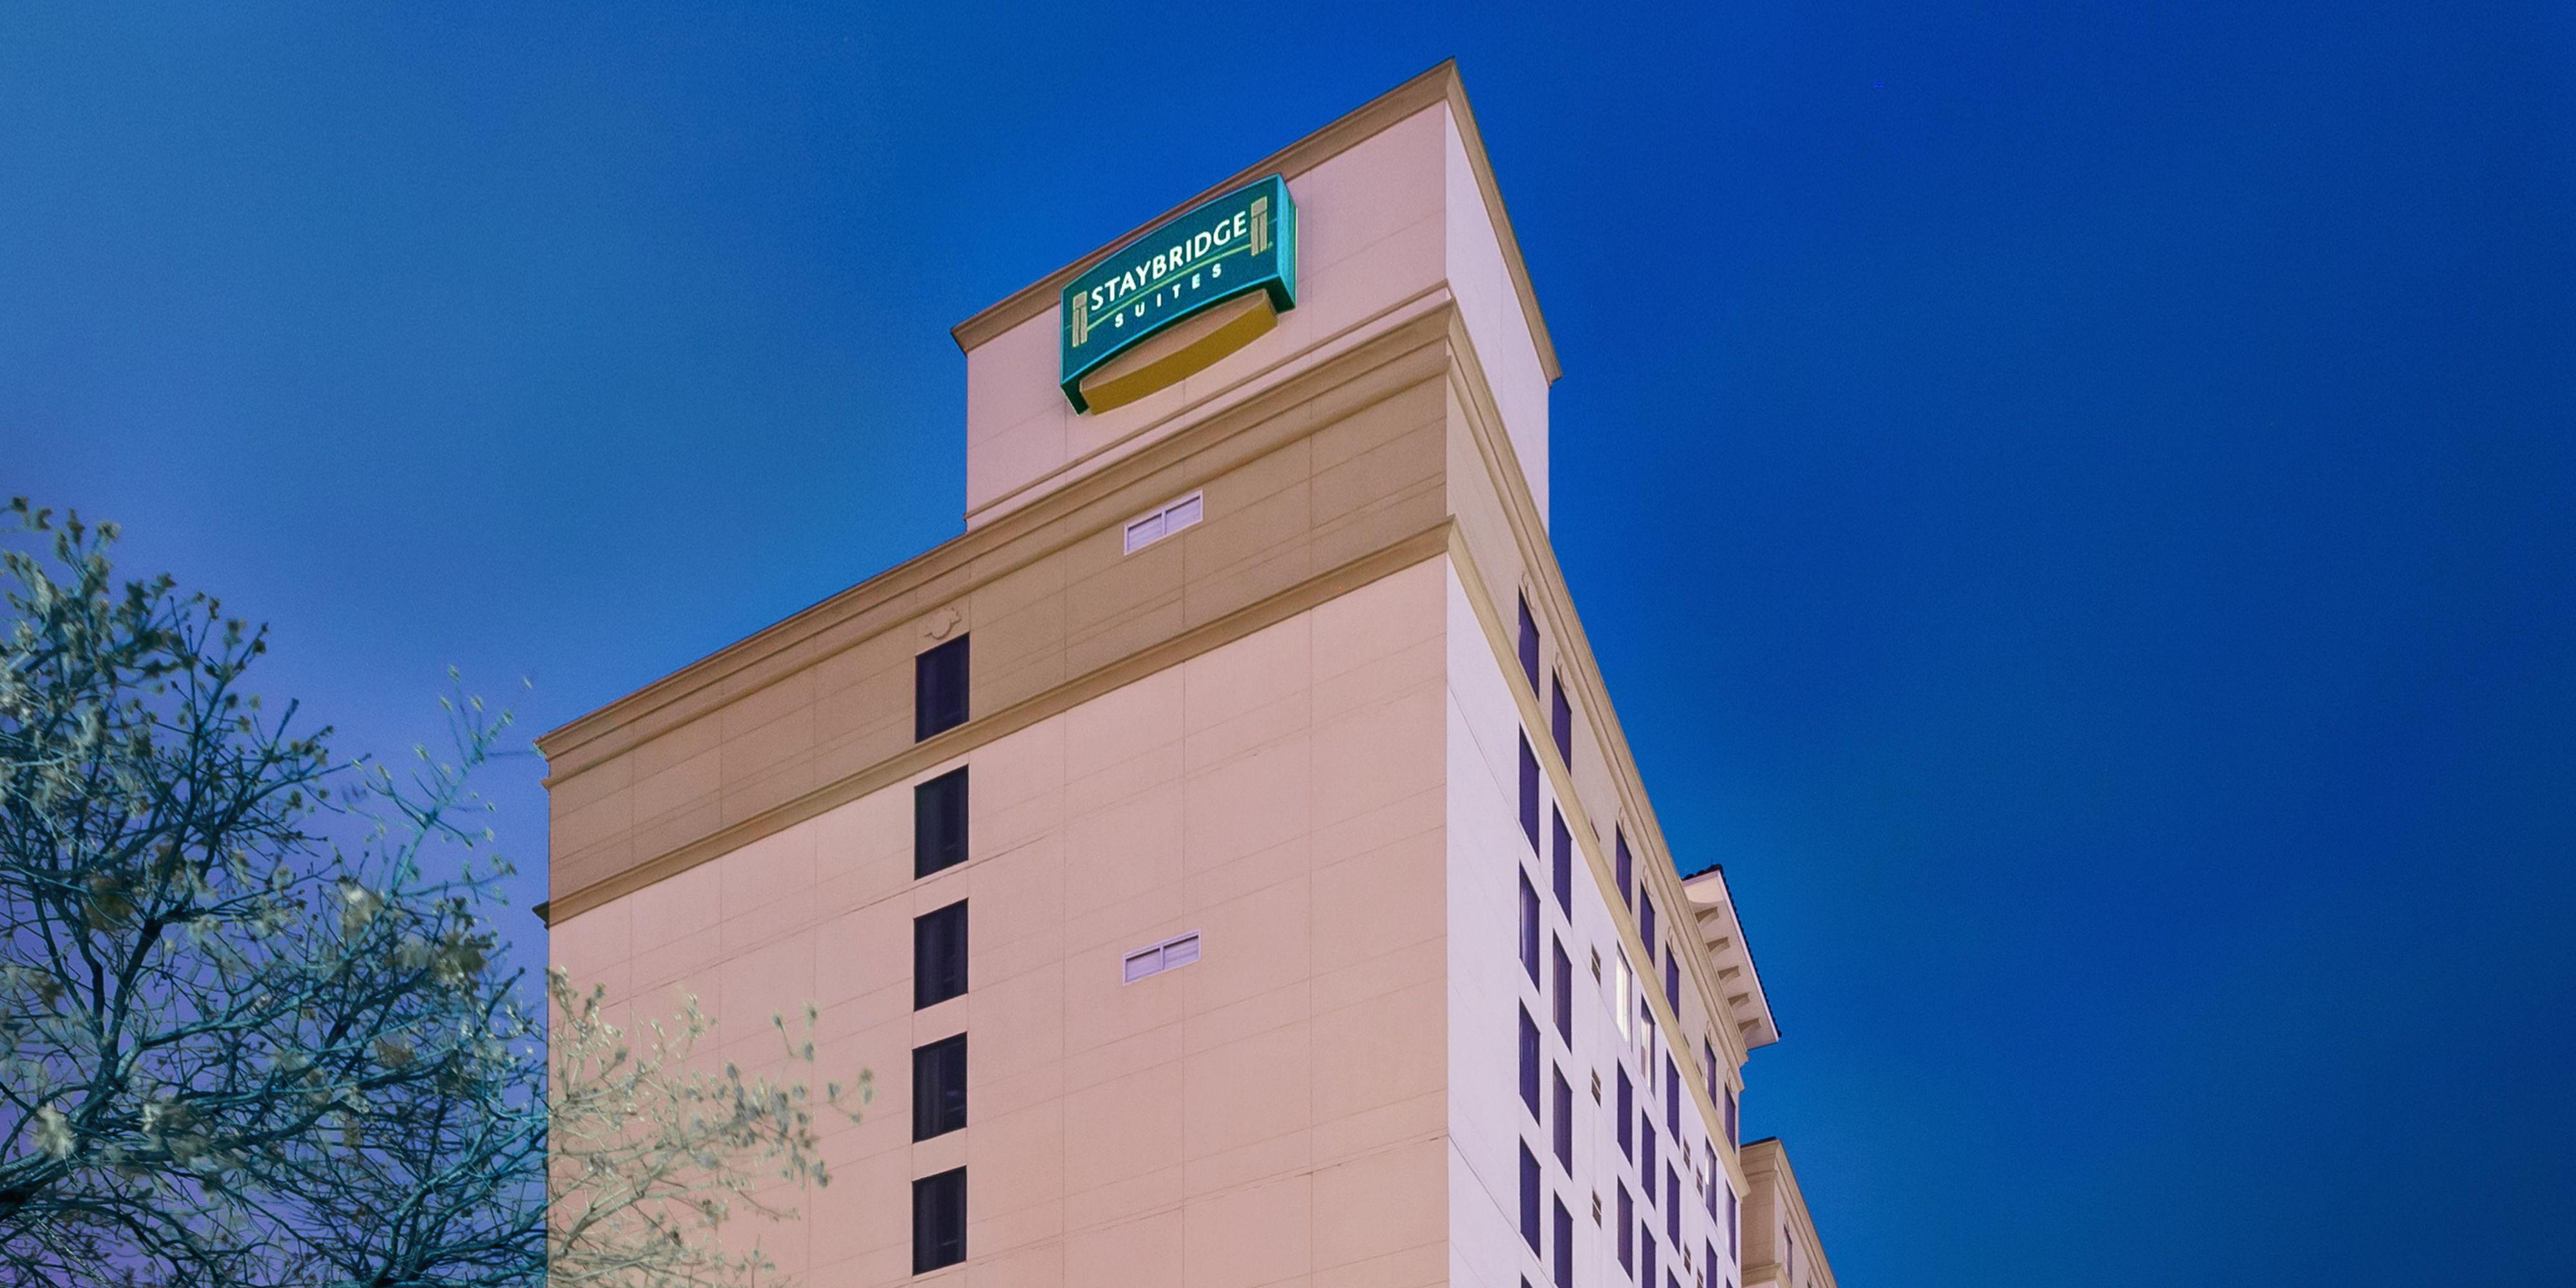 Staybridge Suites San Antonio Downtown Conv Ctr image 0